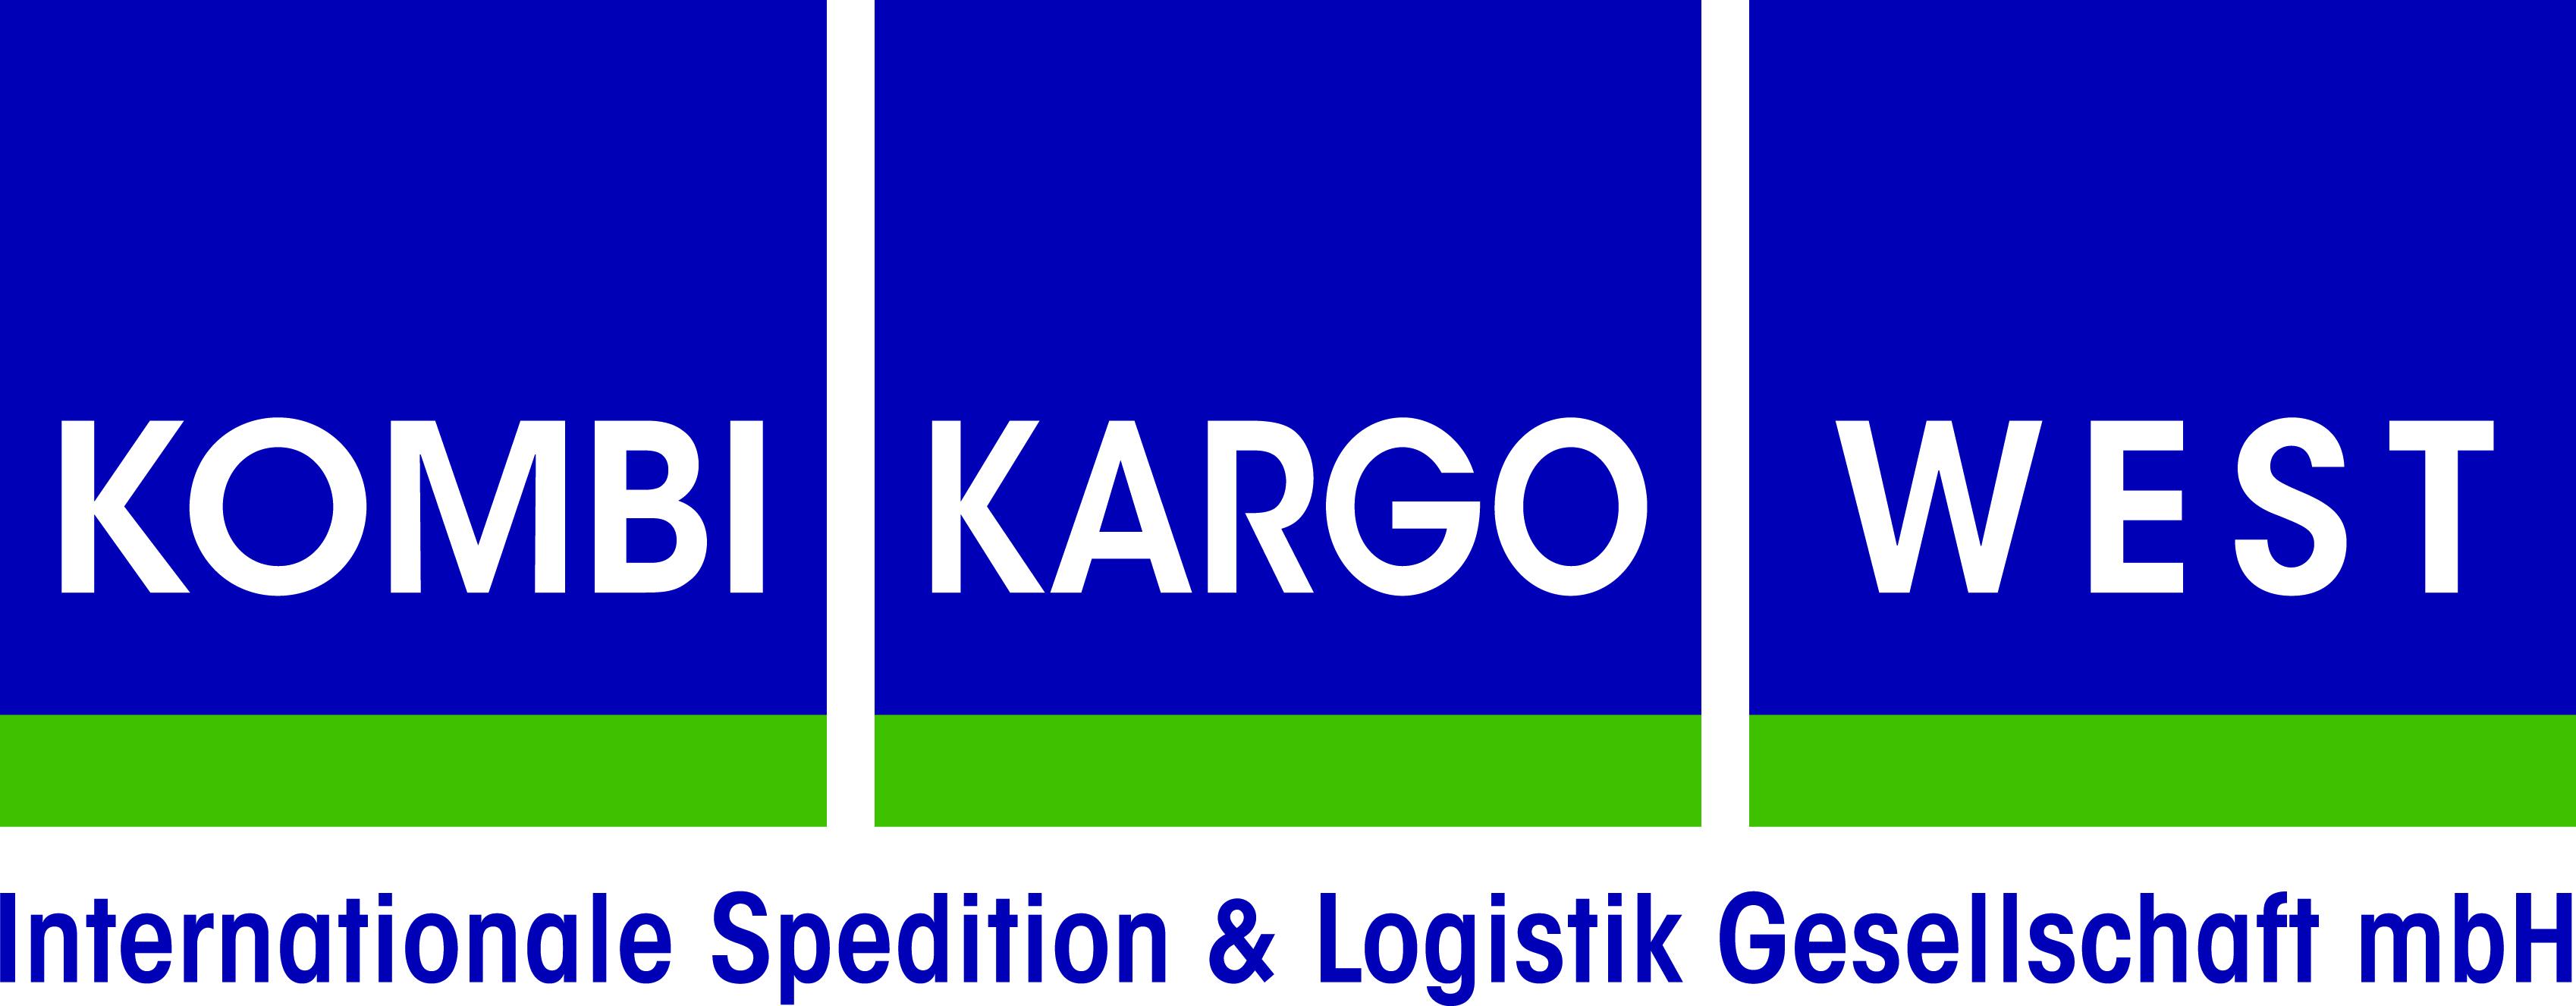 KOMBI KARGO WEST Internationale Spedition & Logistik GmbH